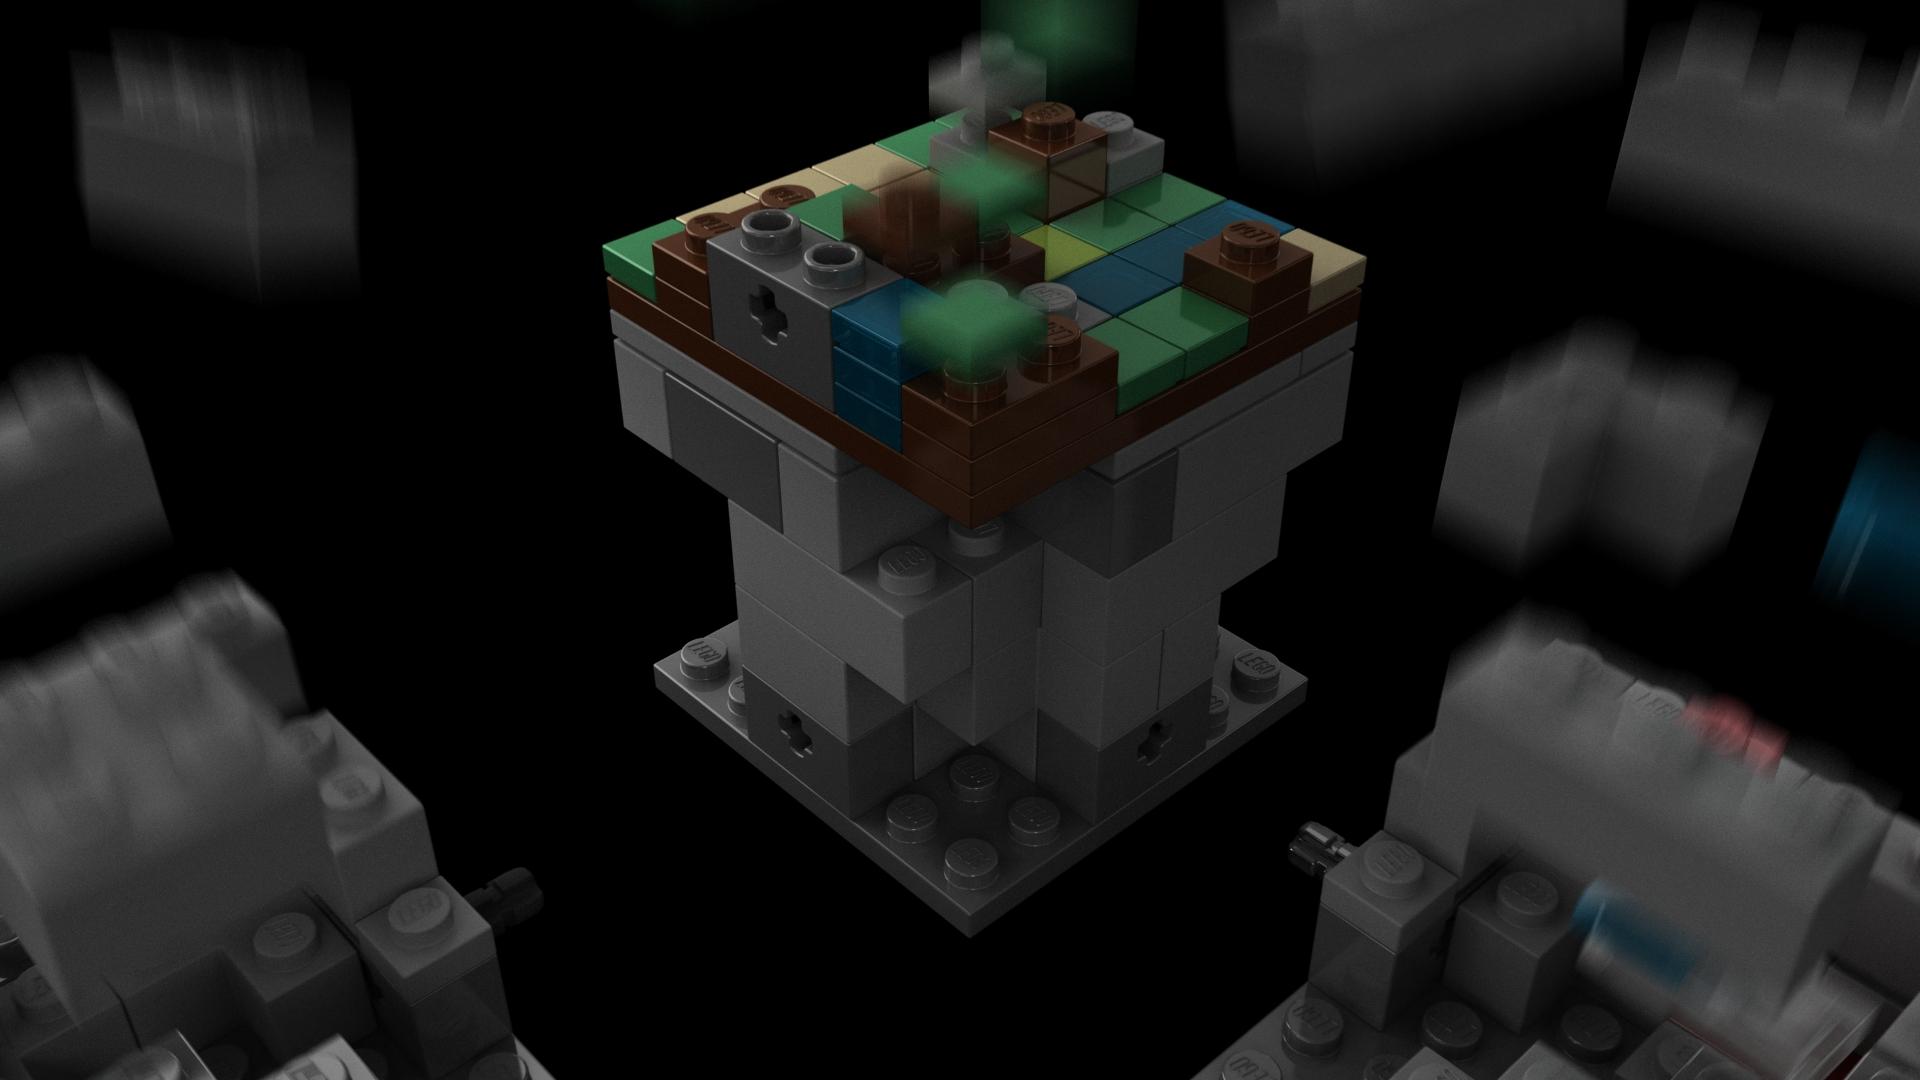 lego_minecraft_0032